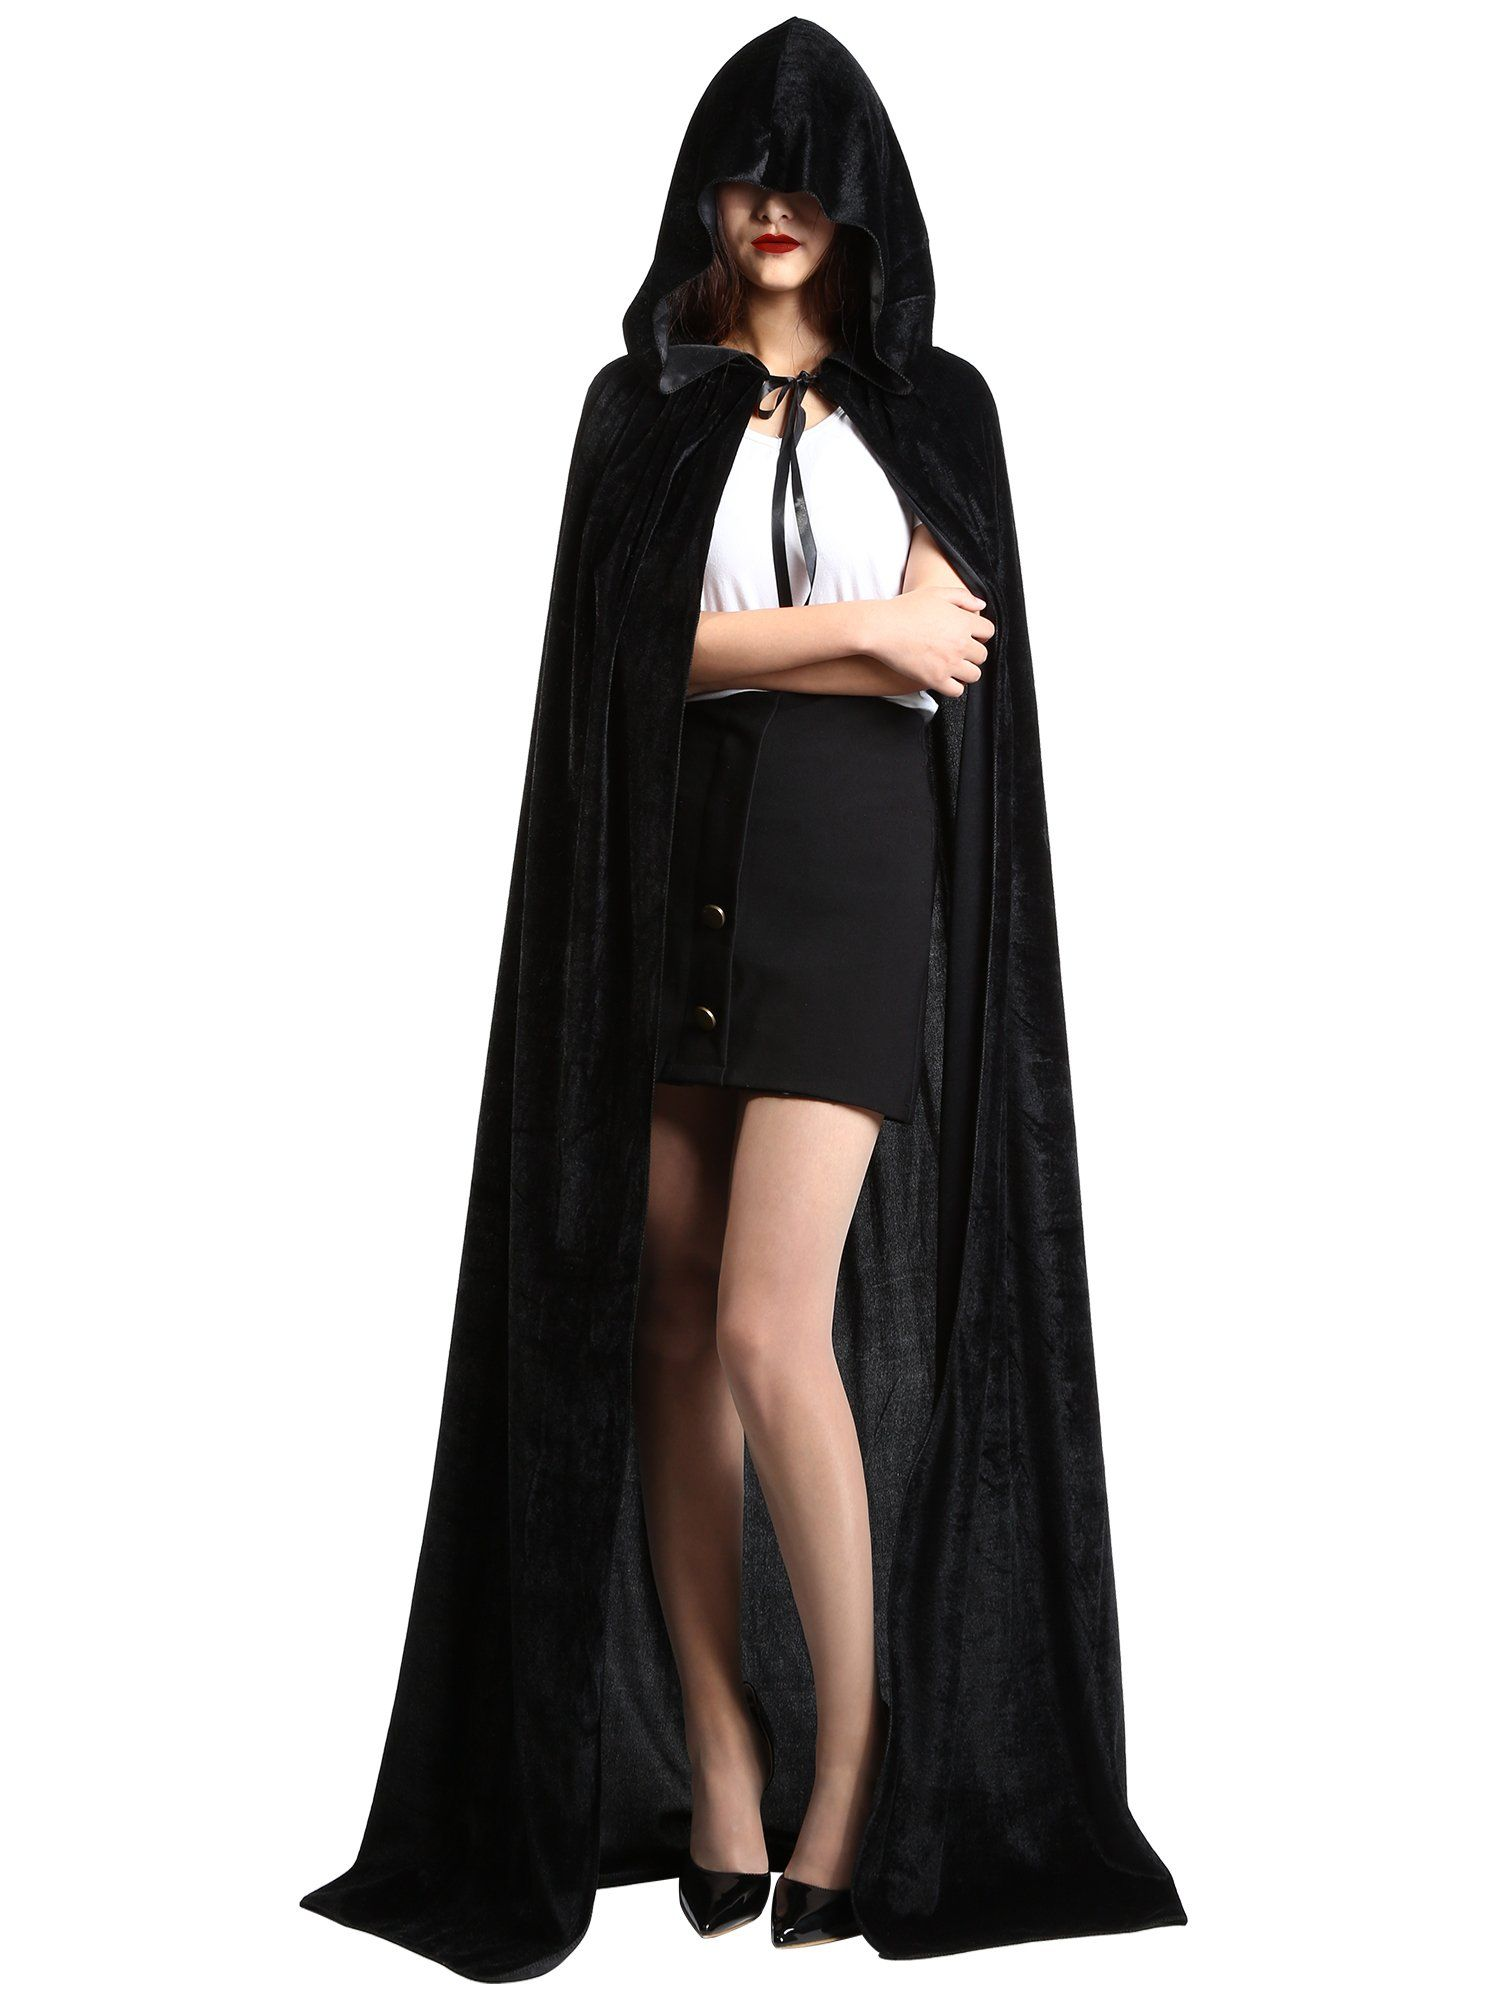 halloween costumes 2016 satinior unisex full length hooded cloak adult velvet cape halloween party cosplay costume cloak l size velvet black